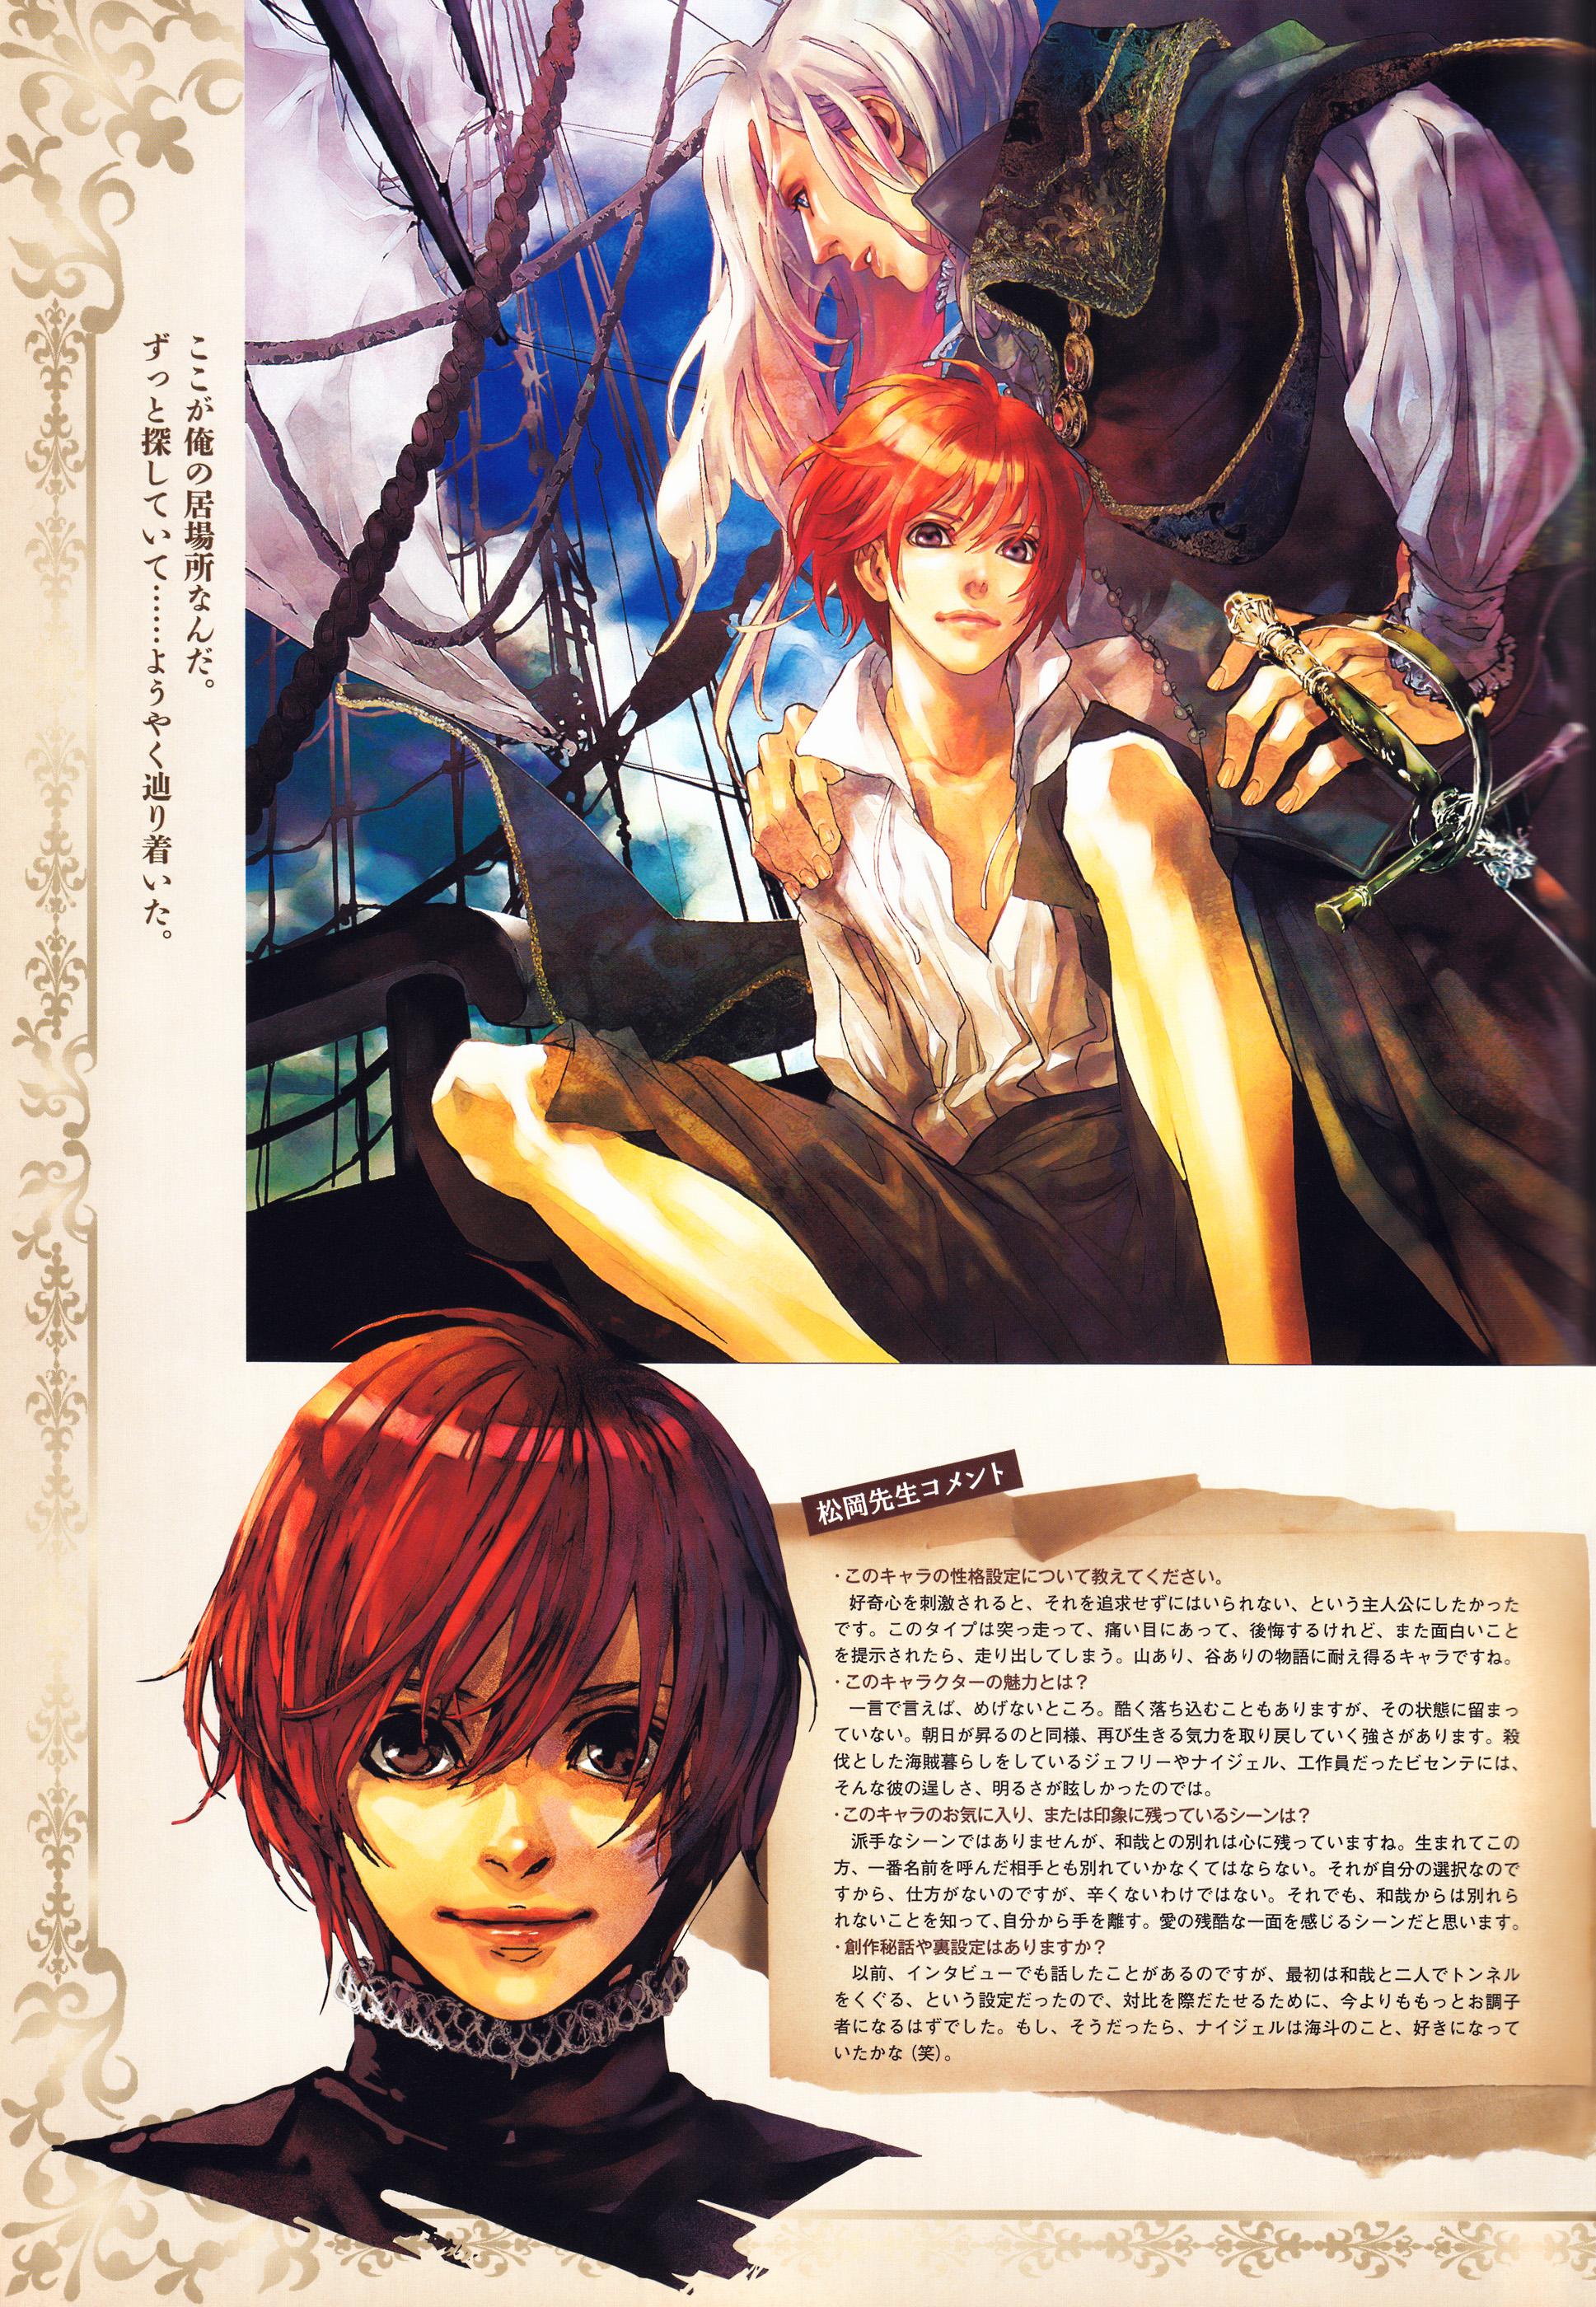 FLESH & BLOOD - Characters (2)